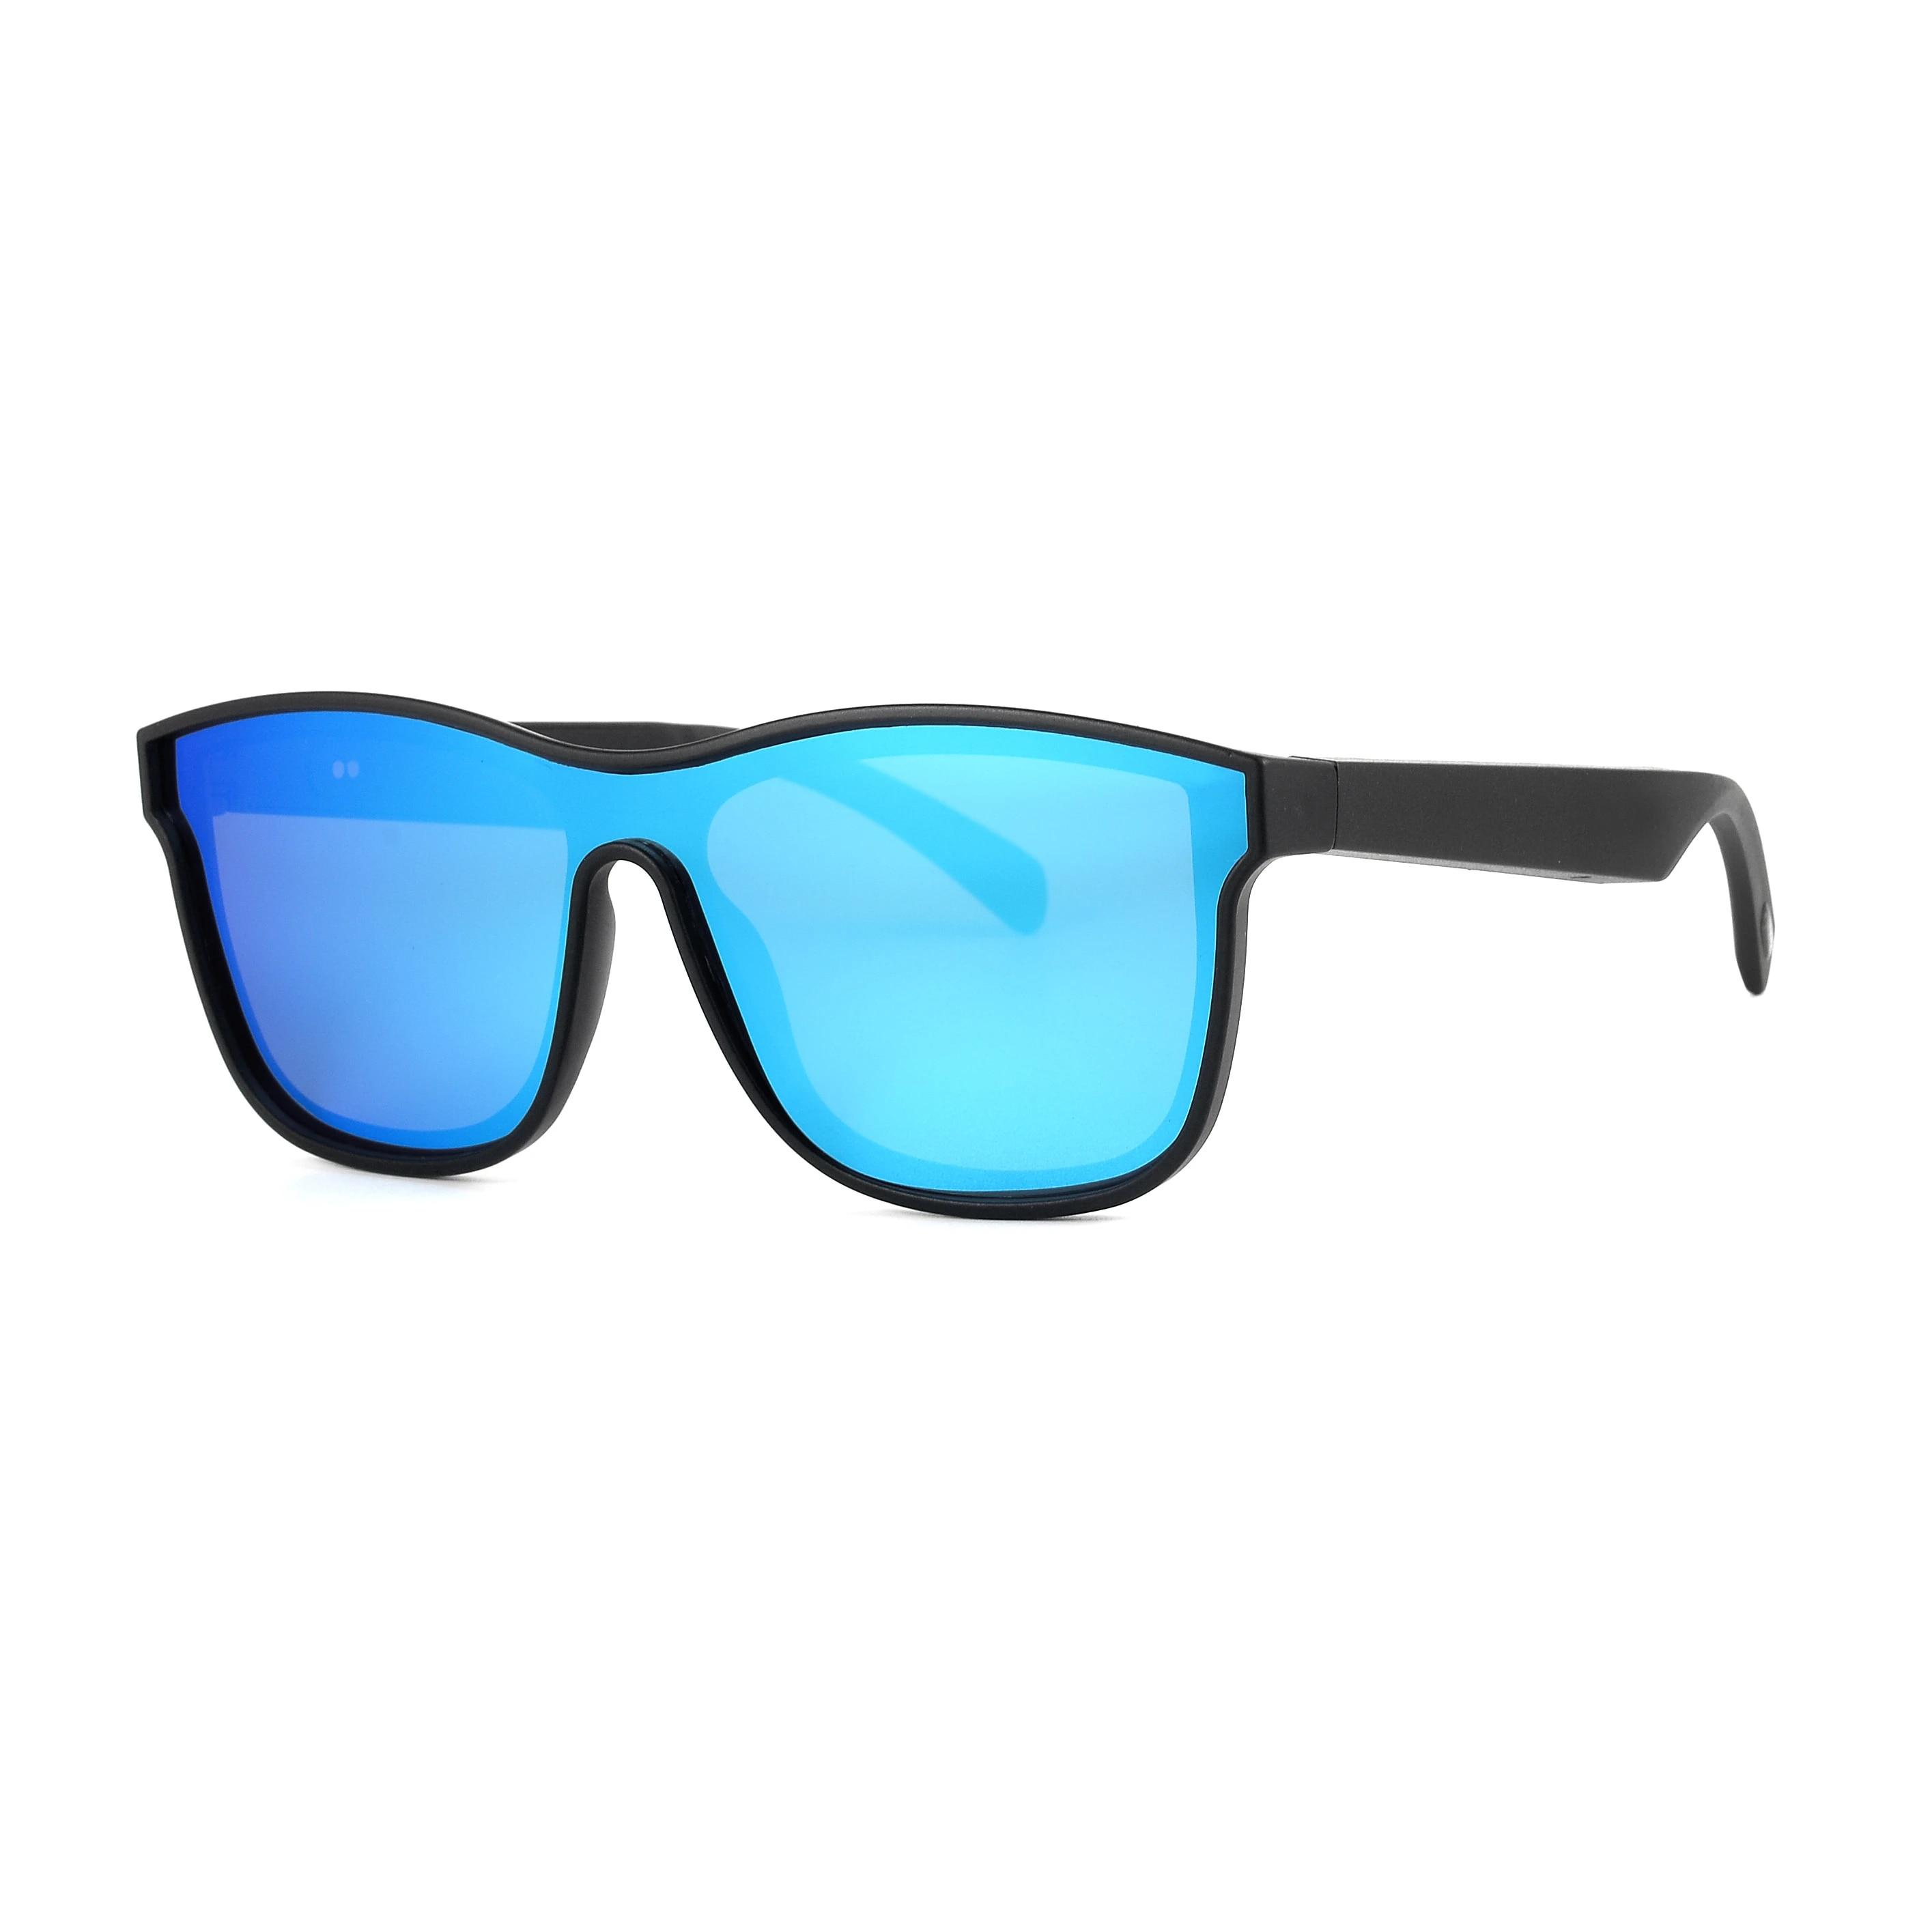 Electronics Wearable Technology Mikutech Open Ear Smart Sunglasses ...